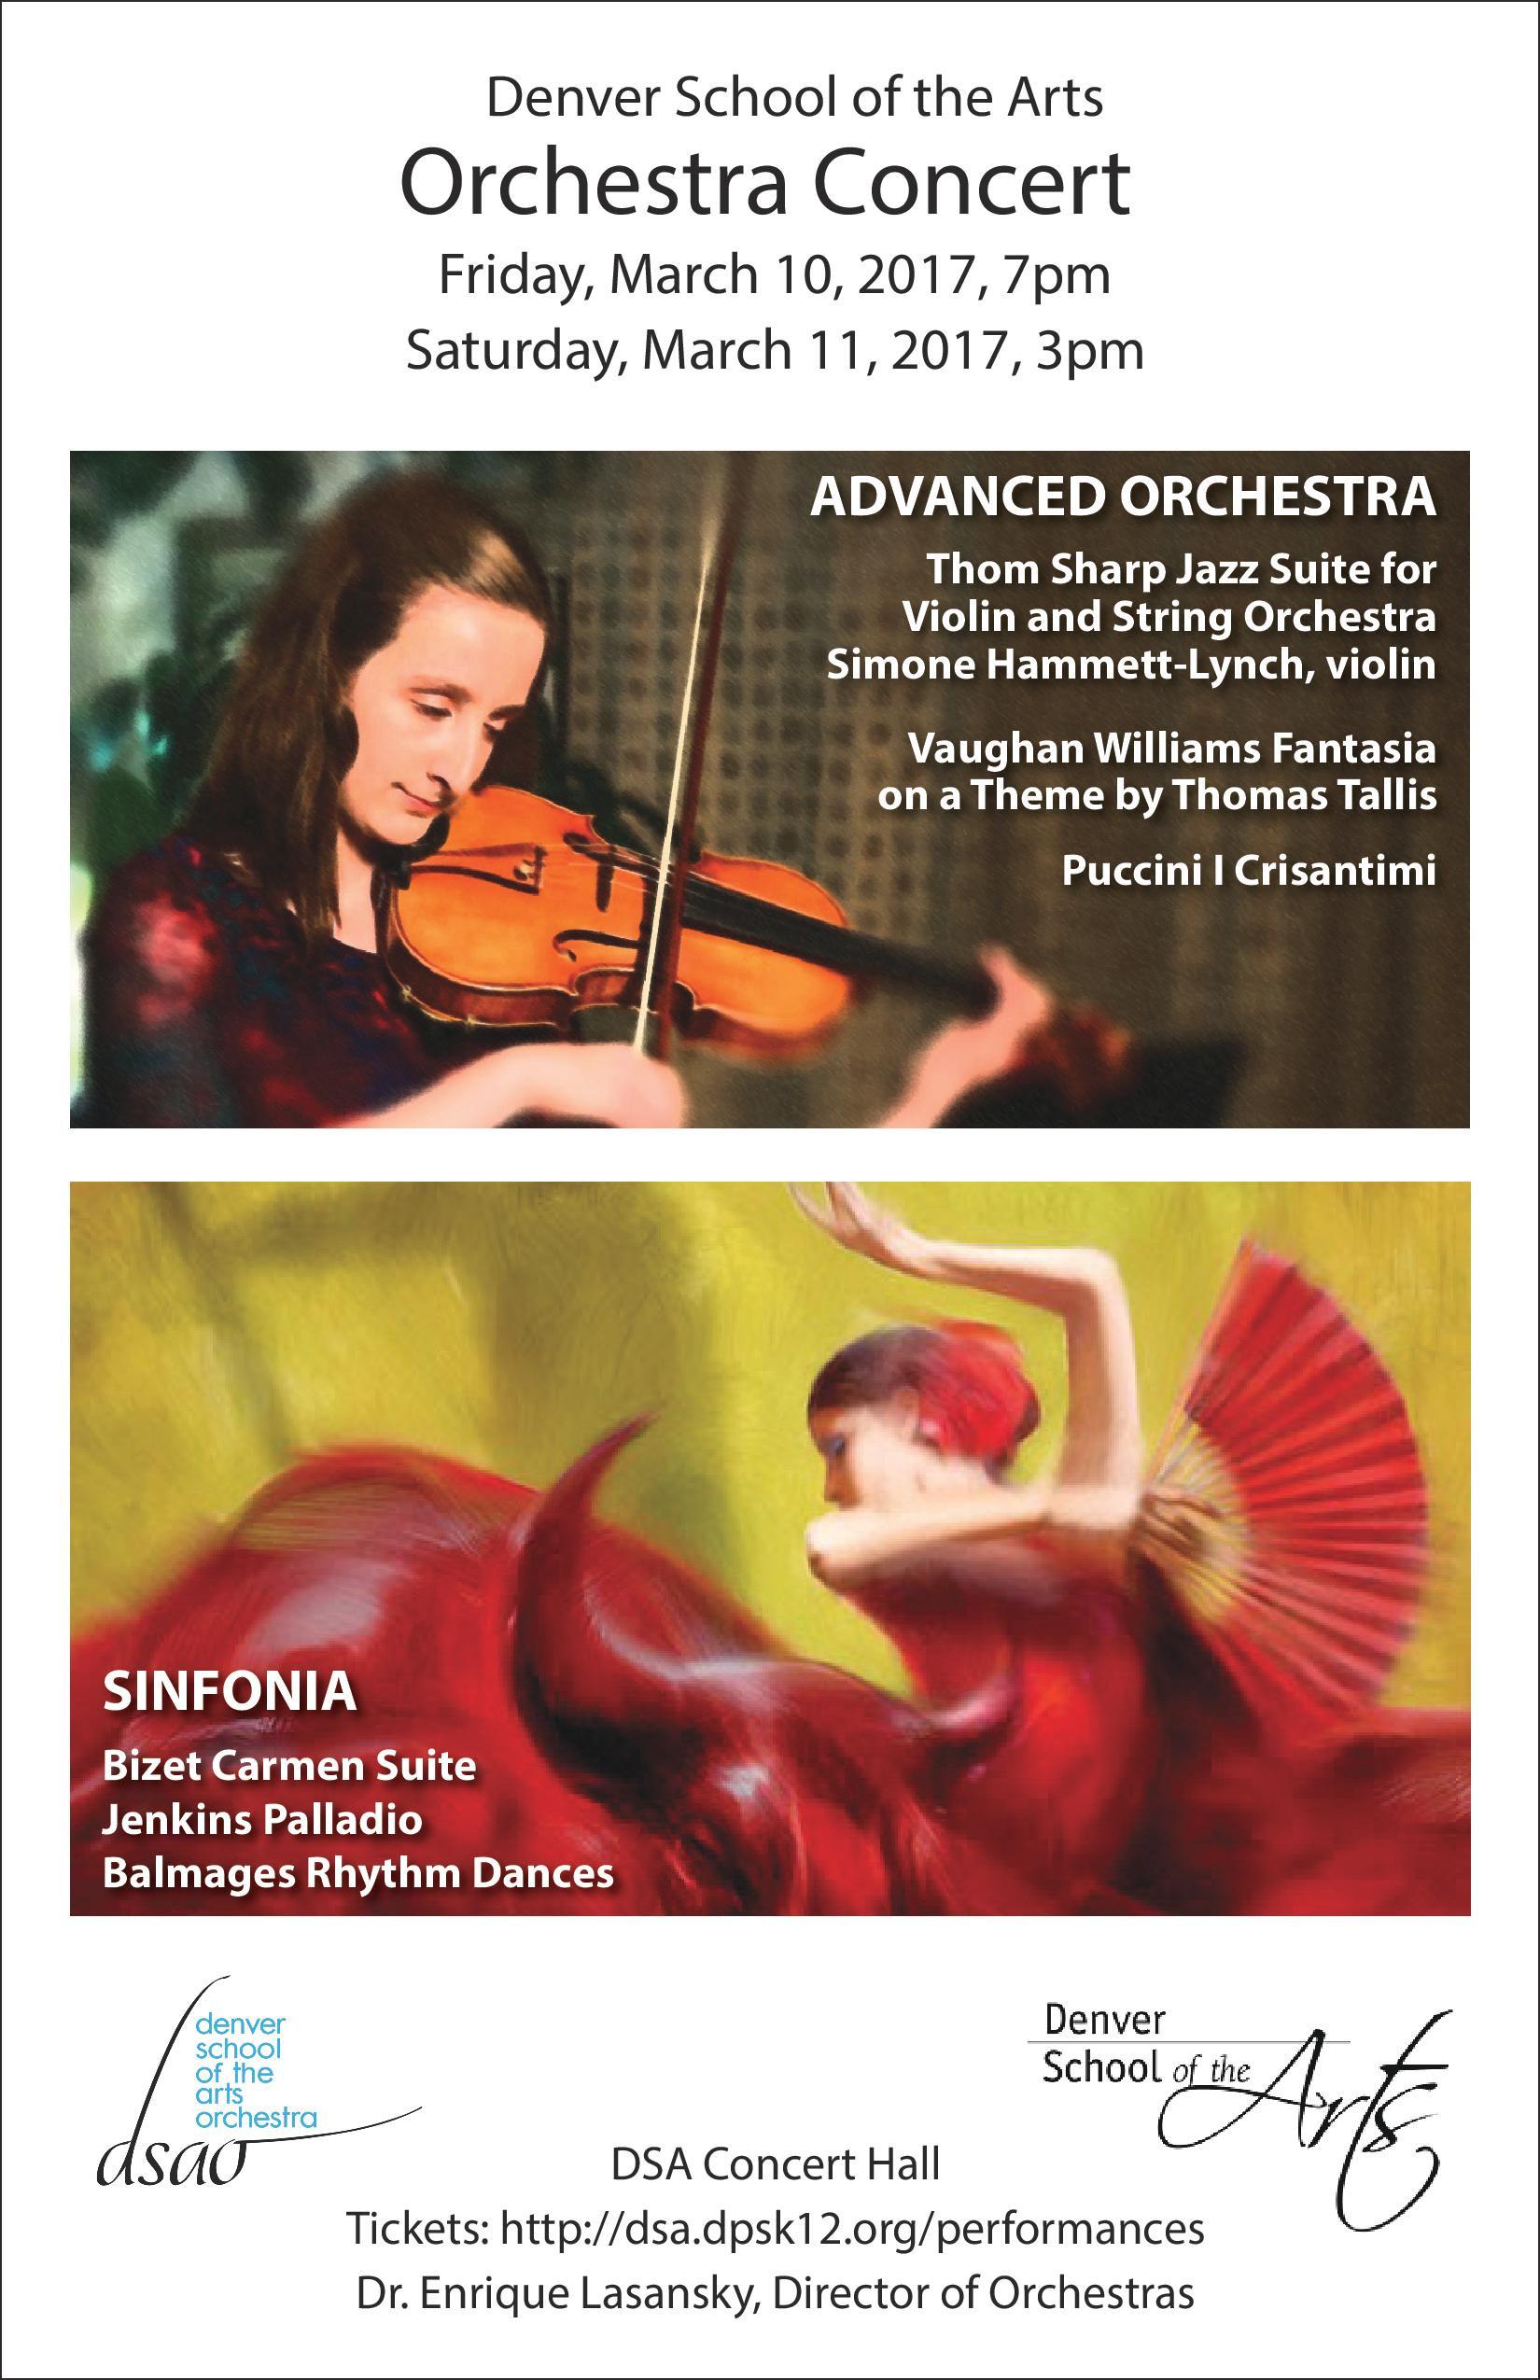 DSA Orchestra | Week of February 26th, 2017